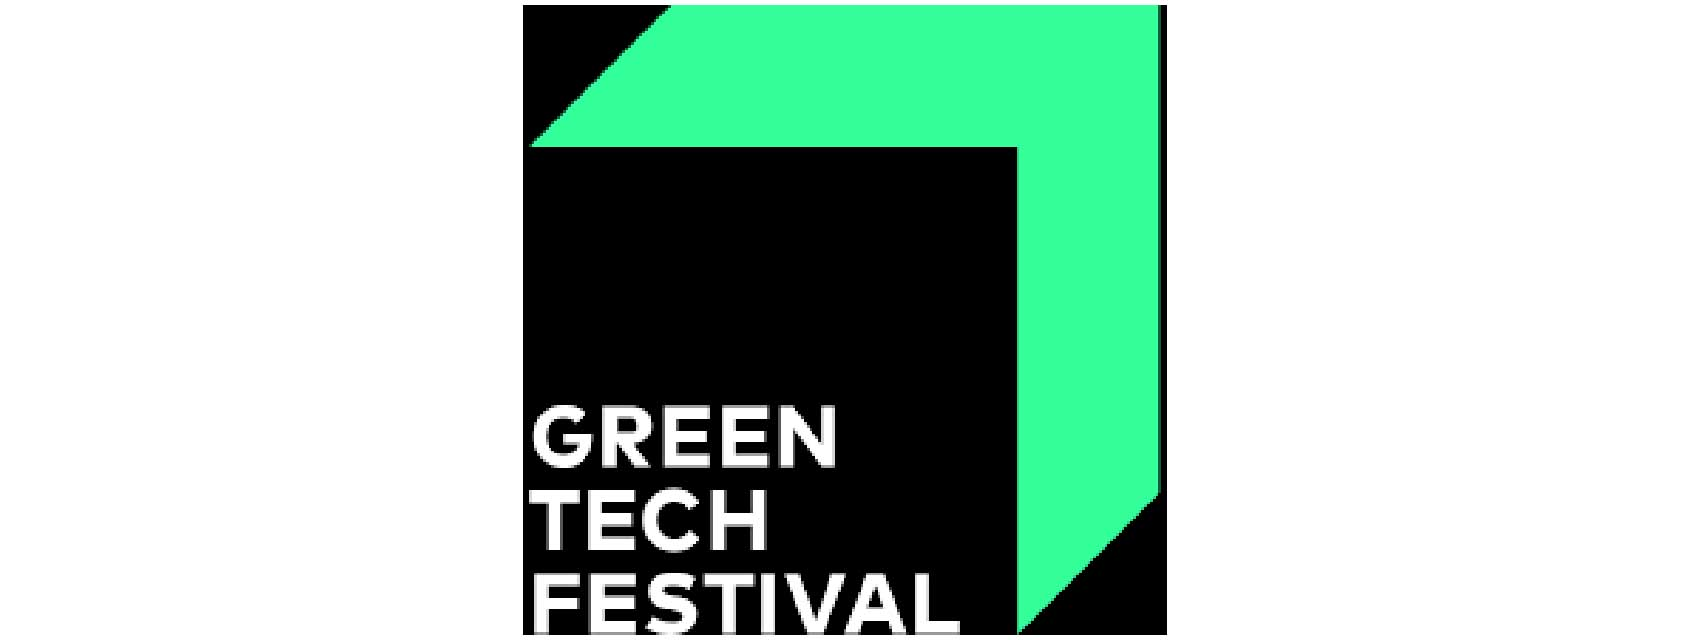 GreenTech-Festival_web